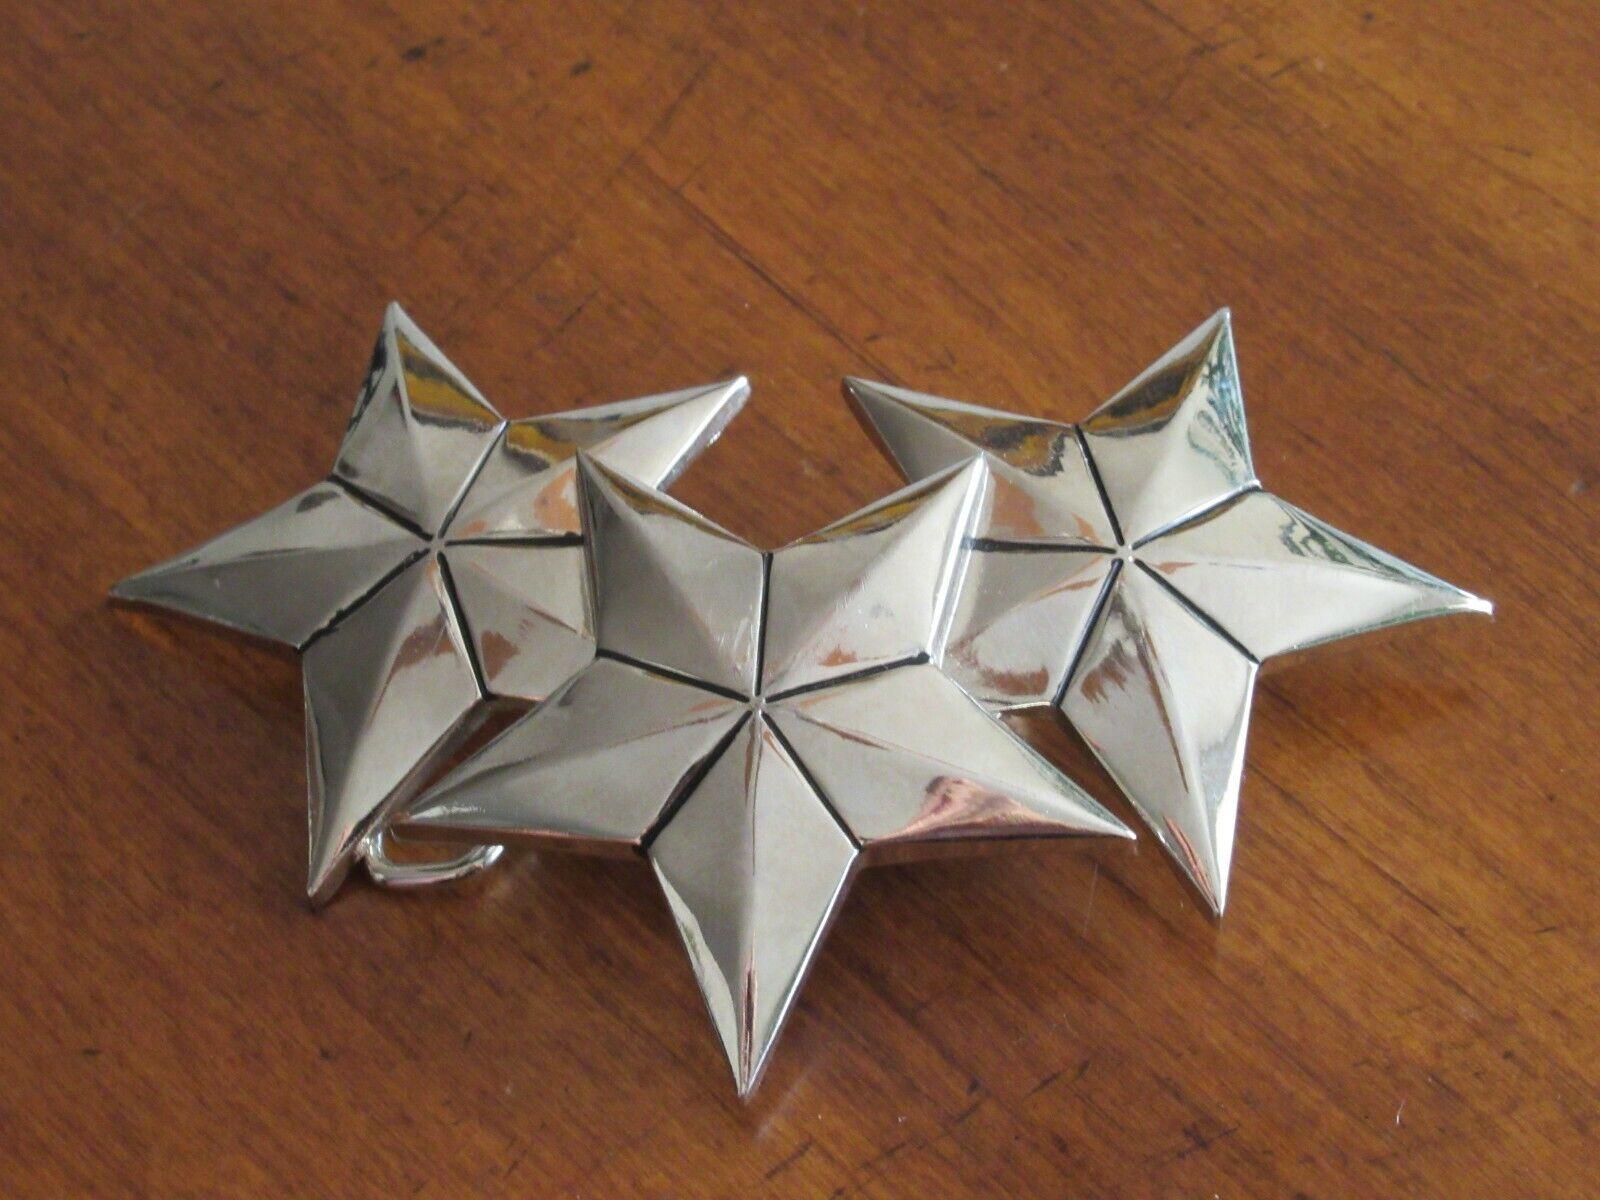 Tristar Silver Tone 3 Stars Belt Buckle by Rock Rebel Cowboy Cowgirl Western